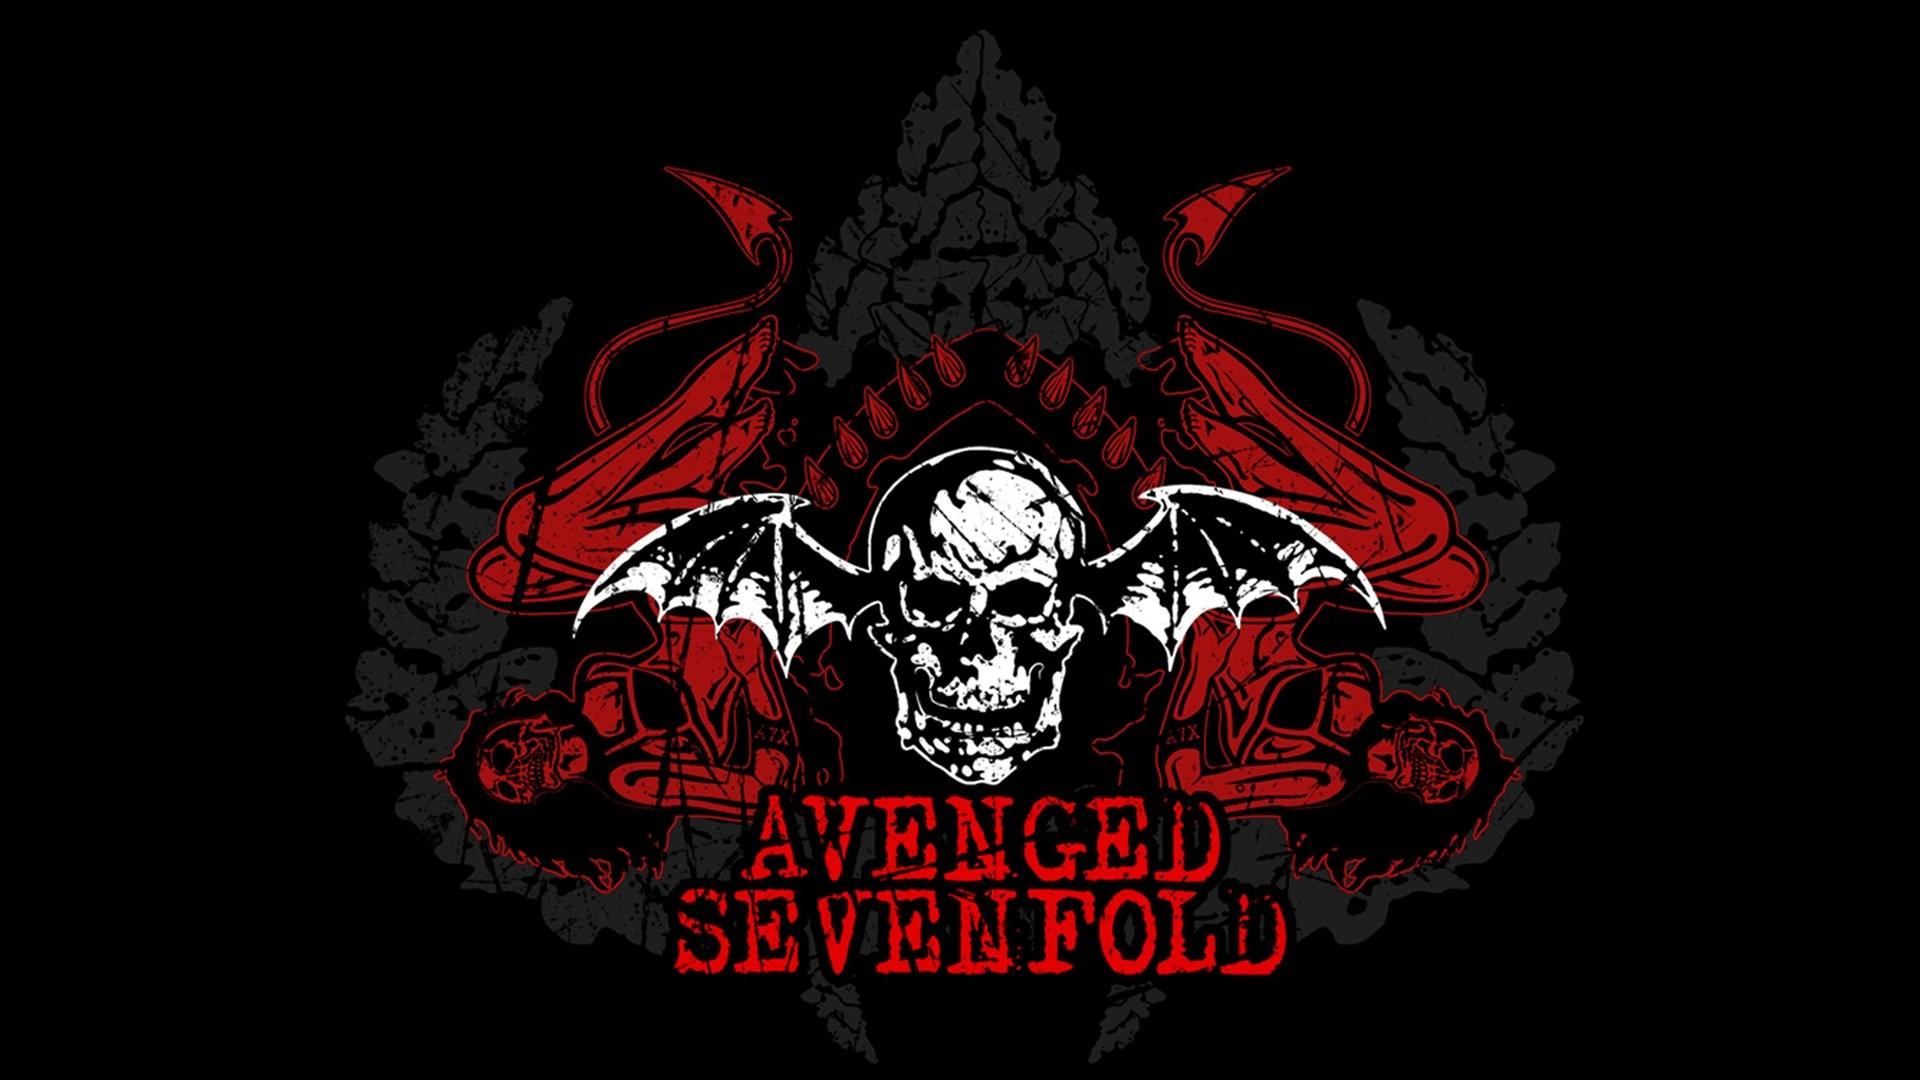 Avenged Sevenfold Hd Wallpaper 72 Images